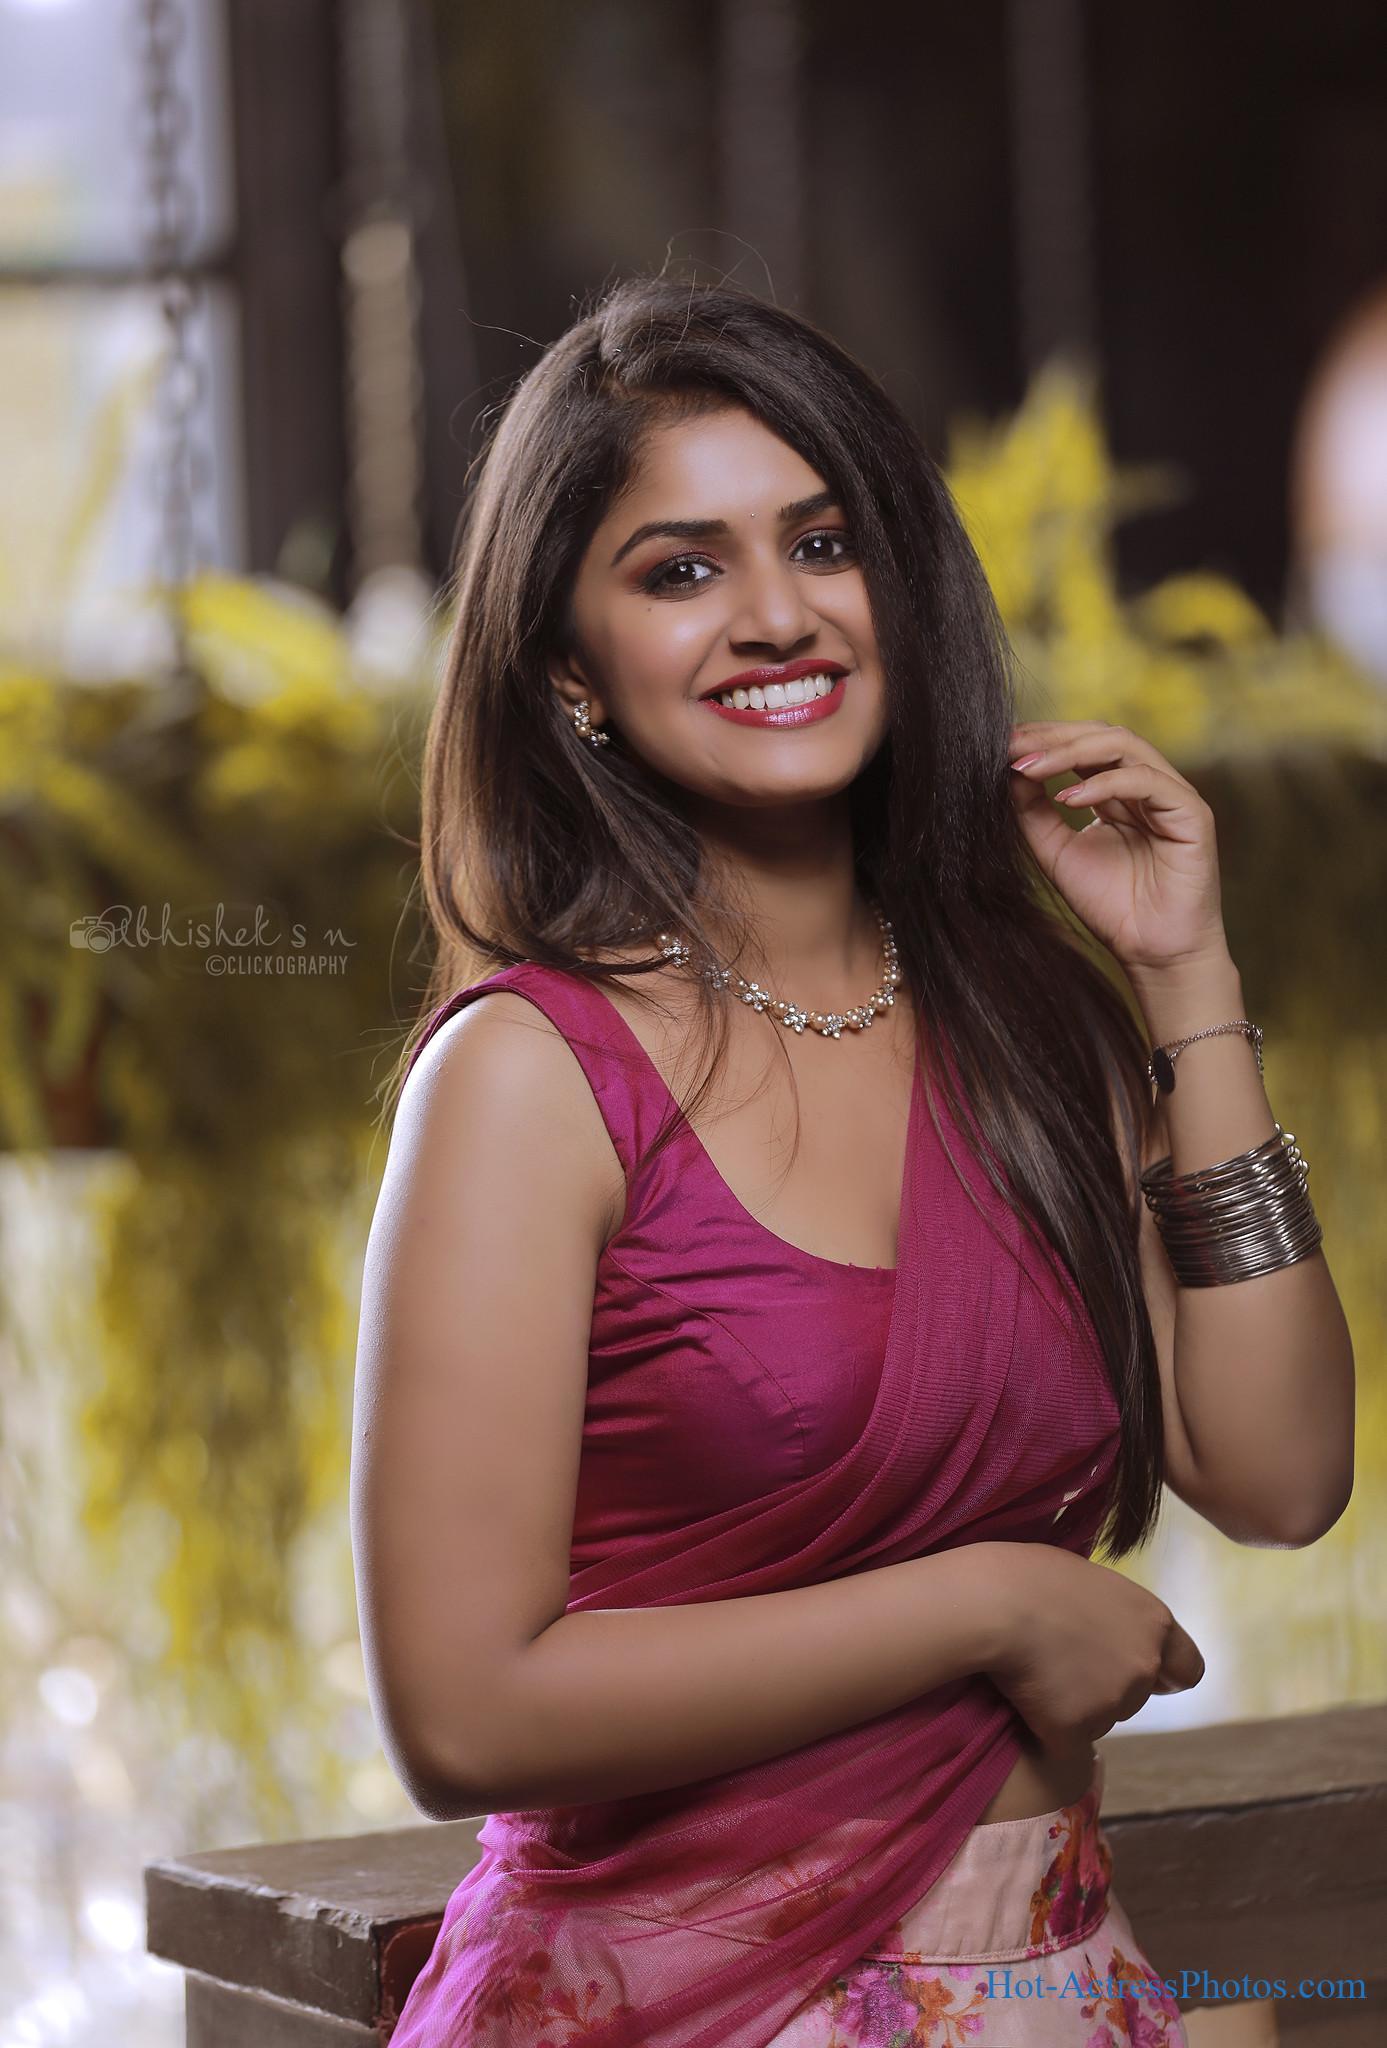 Sanjana Anand Hot Side View In Saree Photos